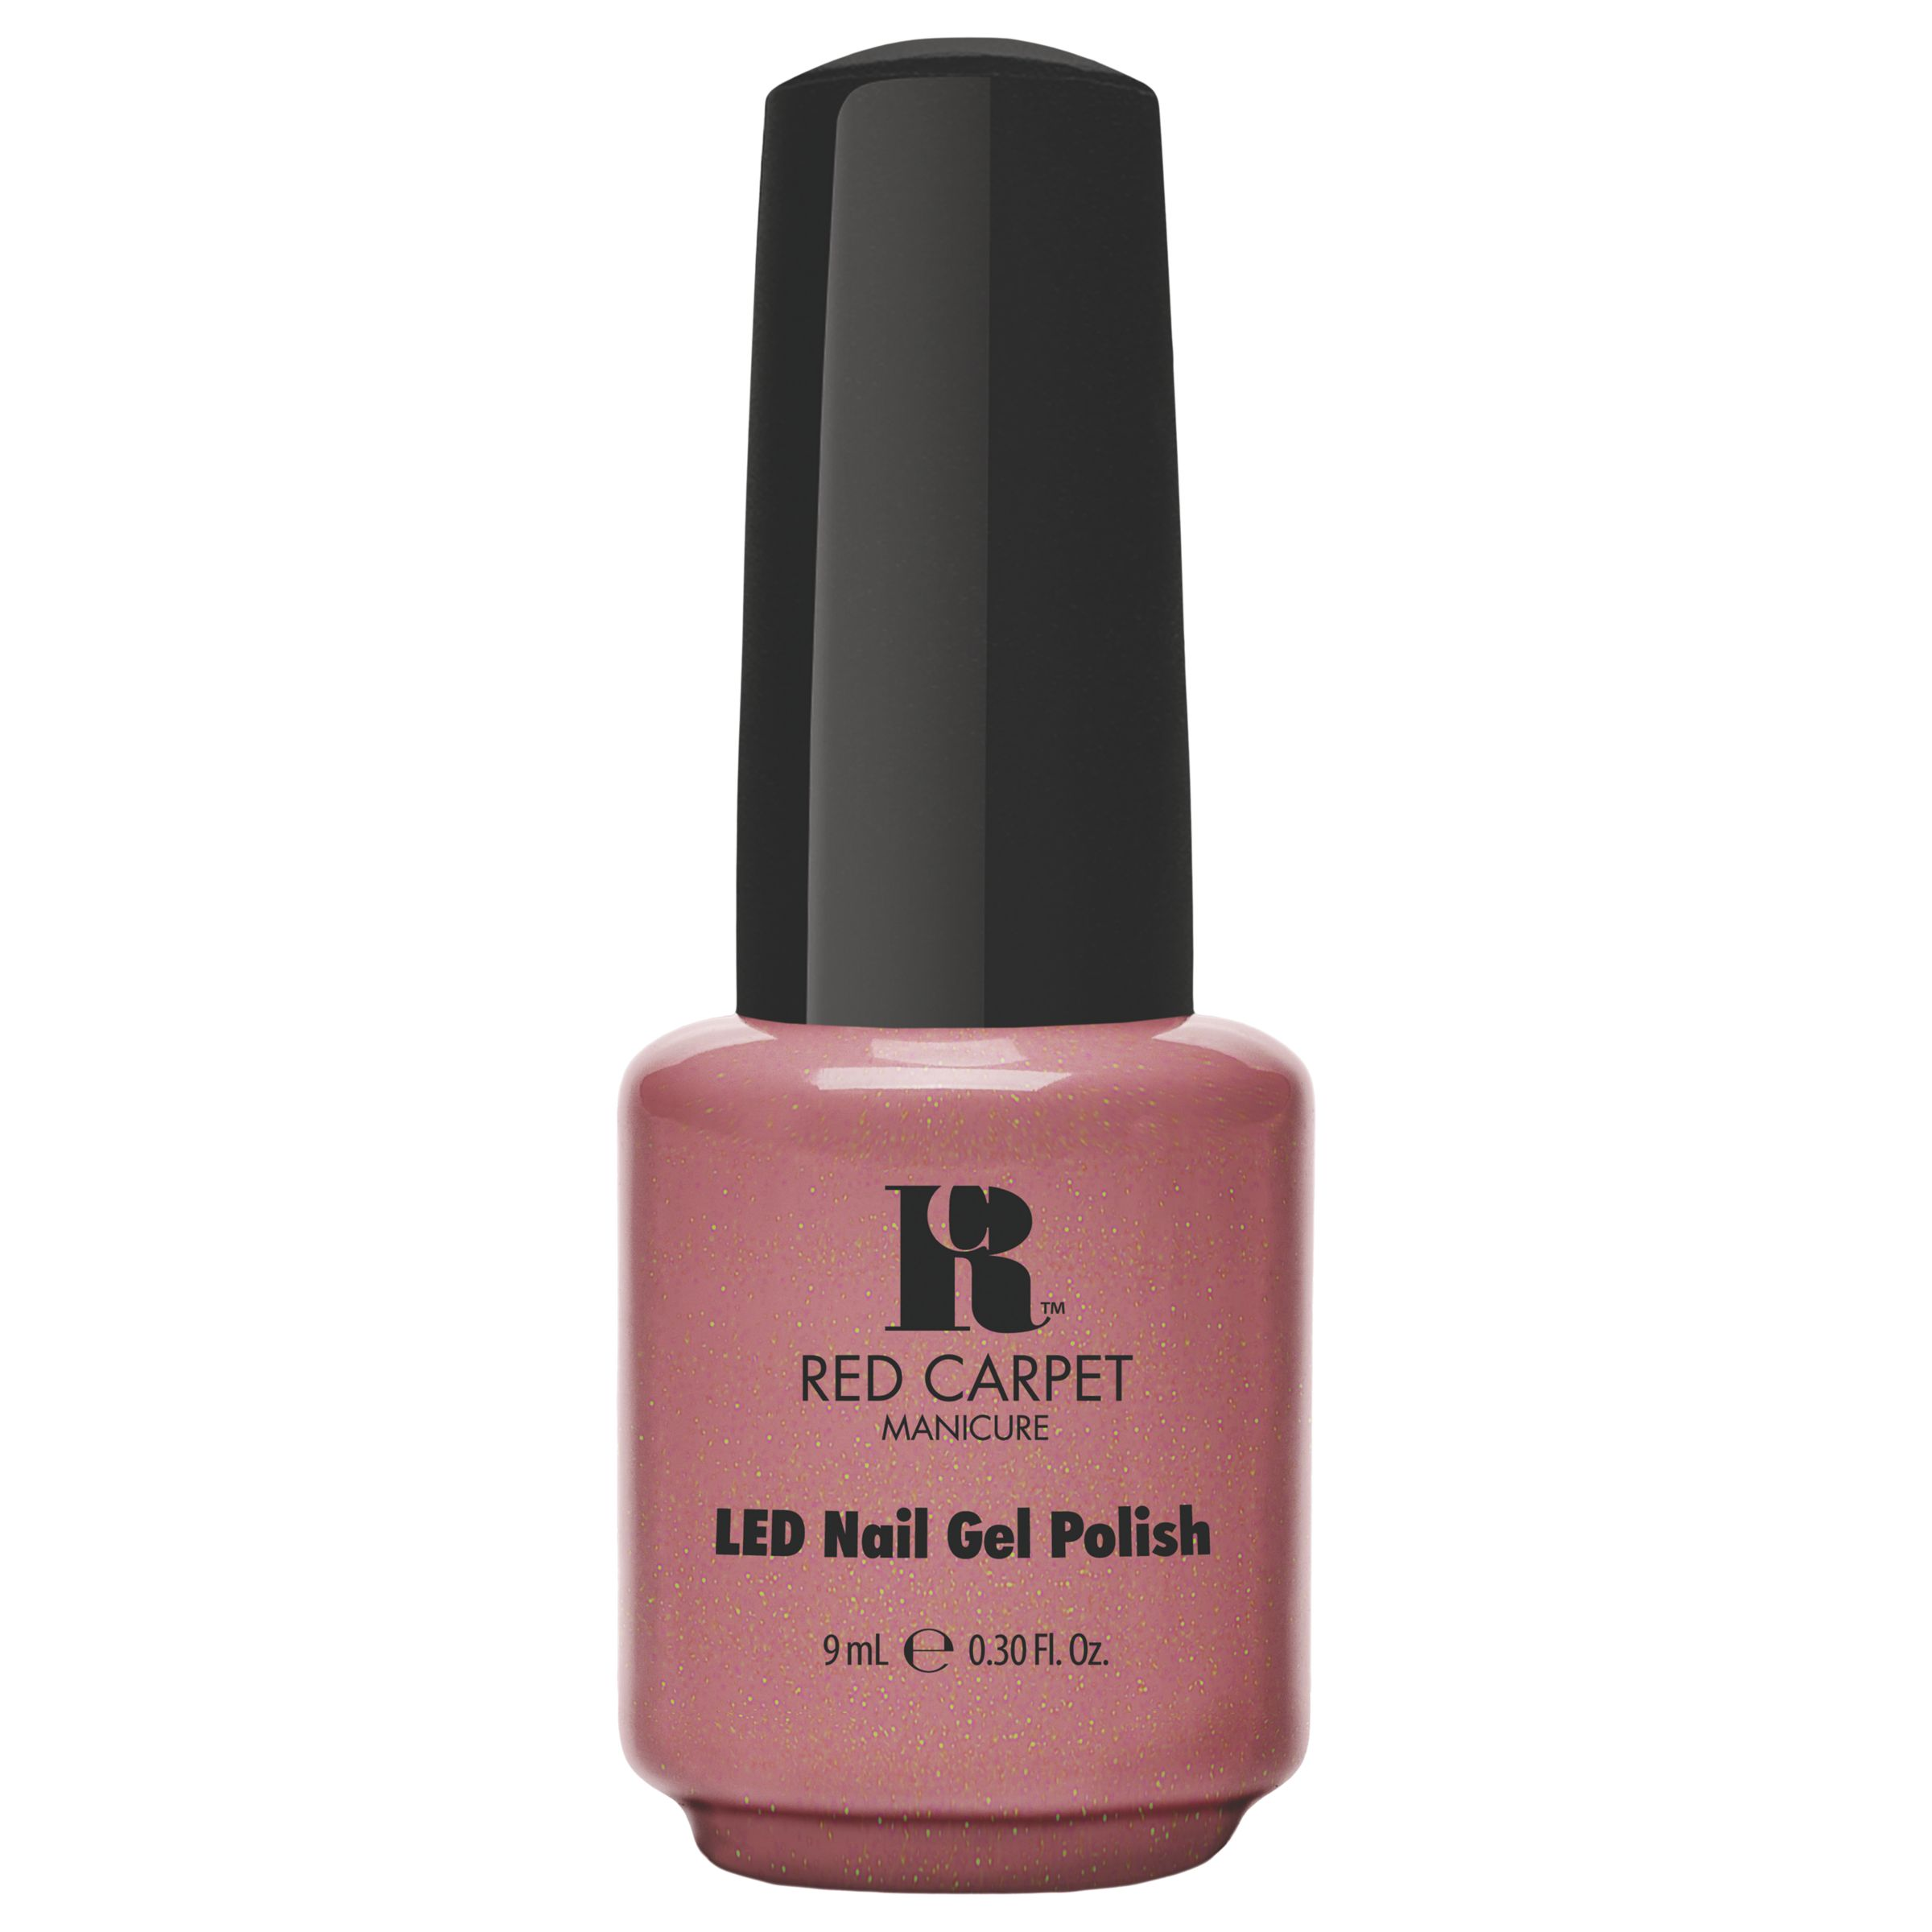 Red Carpet Manicure Red Carpet Manicure LED Gel Nail Polish - Glitter & Metallics, 9ml